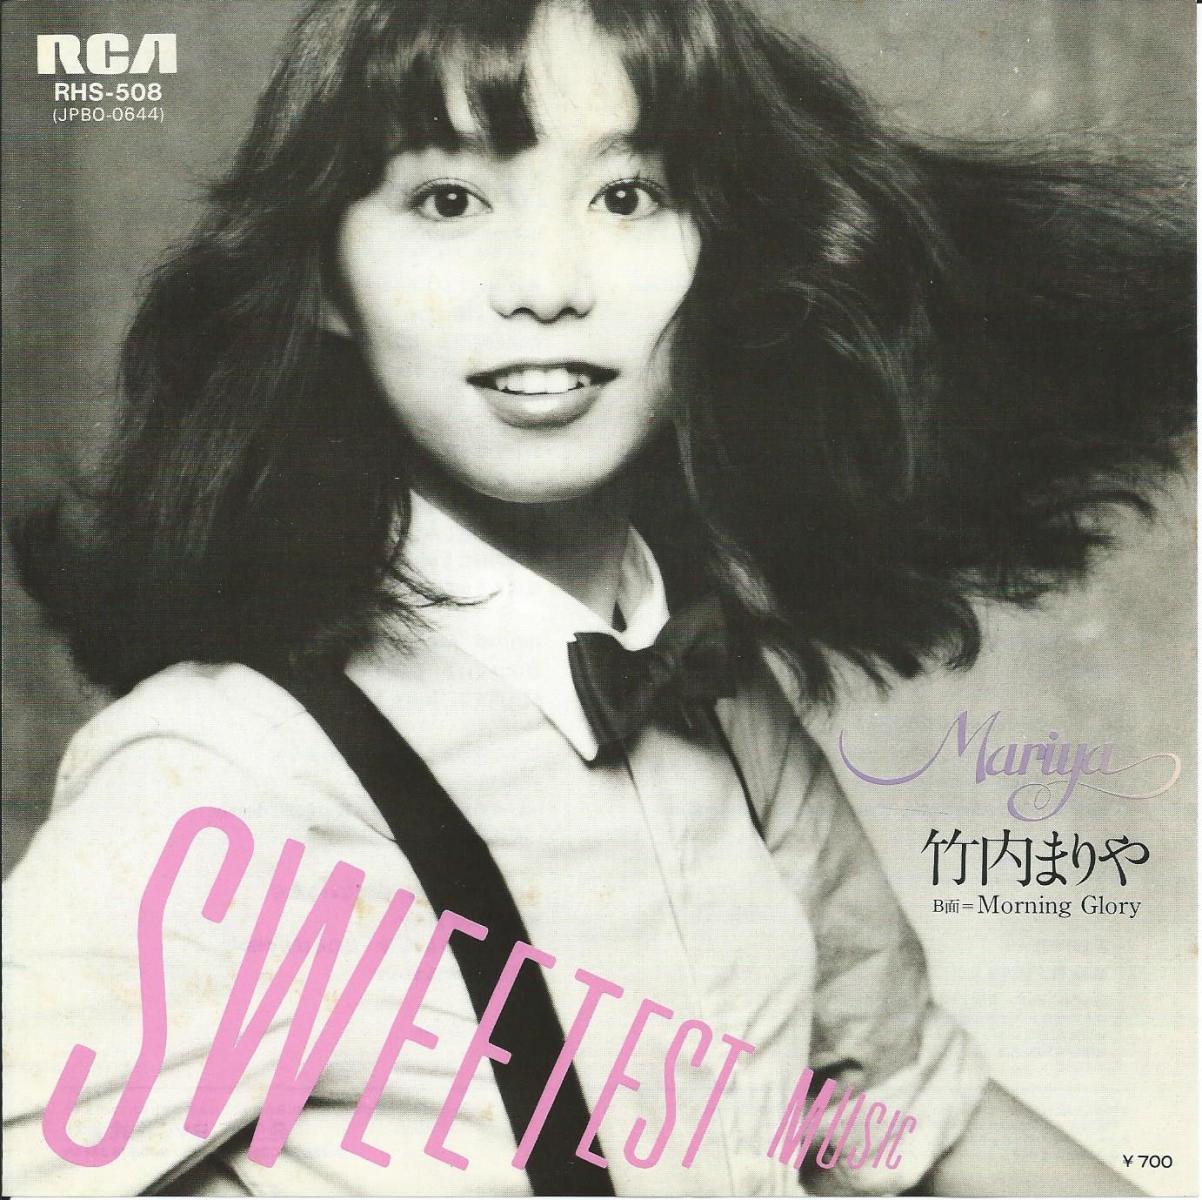 Mariya Takeuchi Love Songs